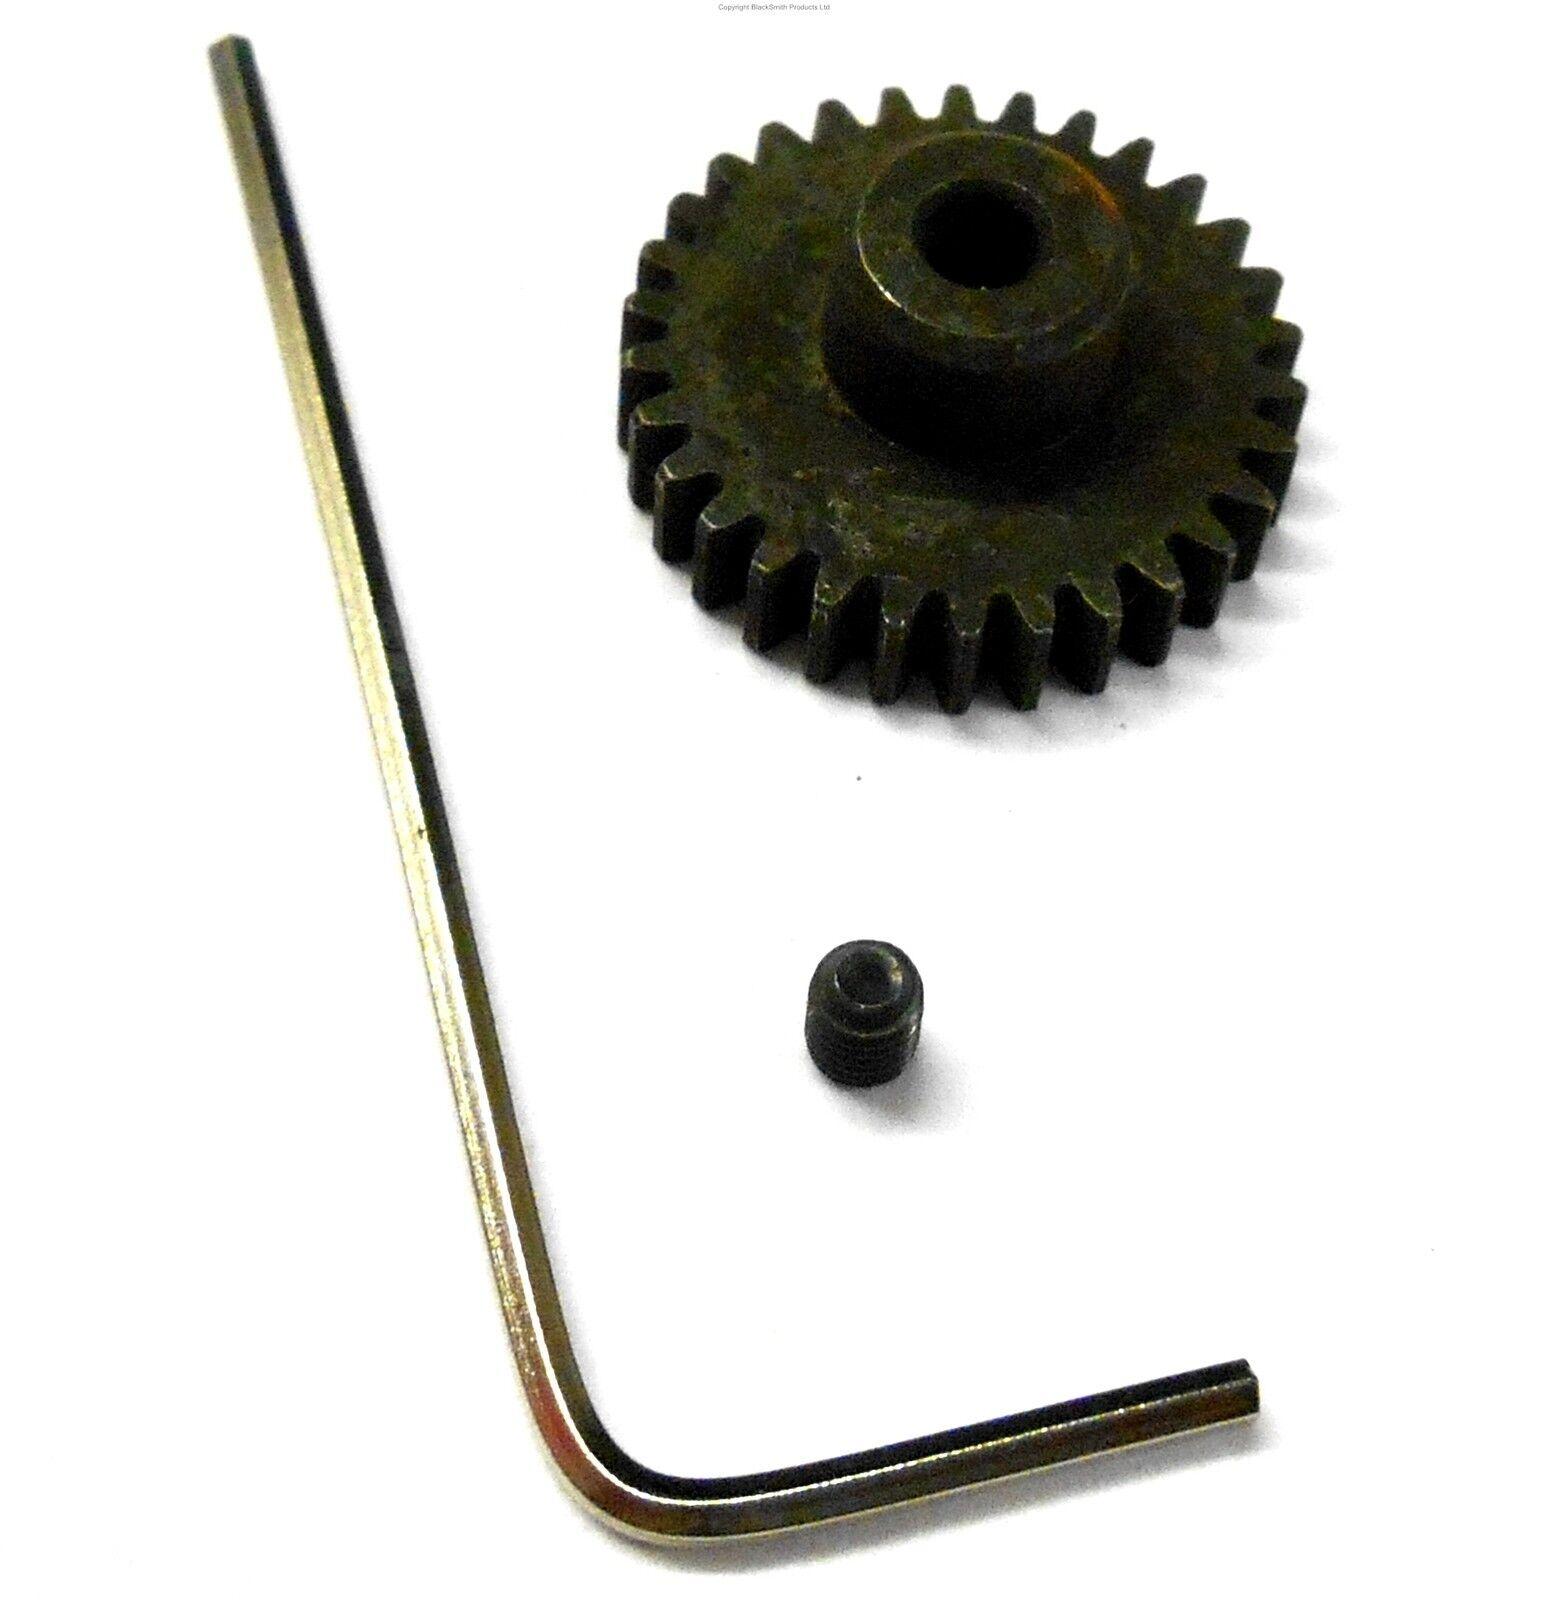 L816 Module 0.8 0.8M 16T 16 Teeth Tooth Motor Pinion Gear Black 1//10 540 3.17mm